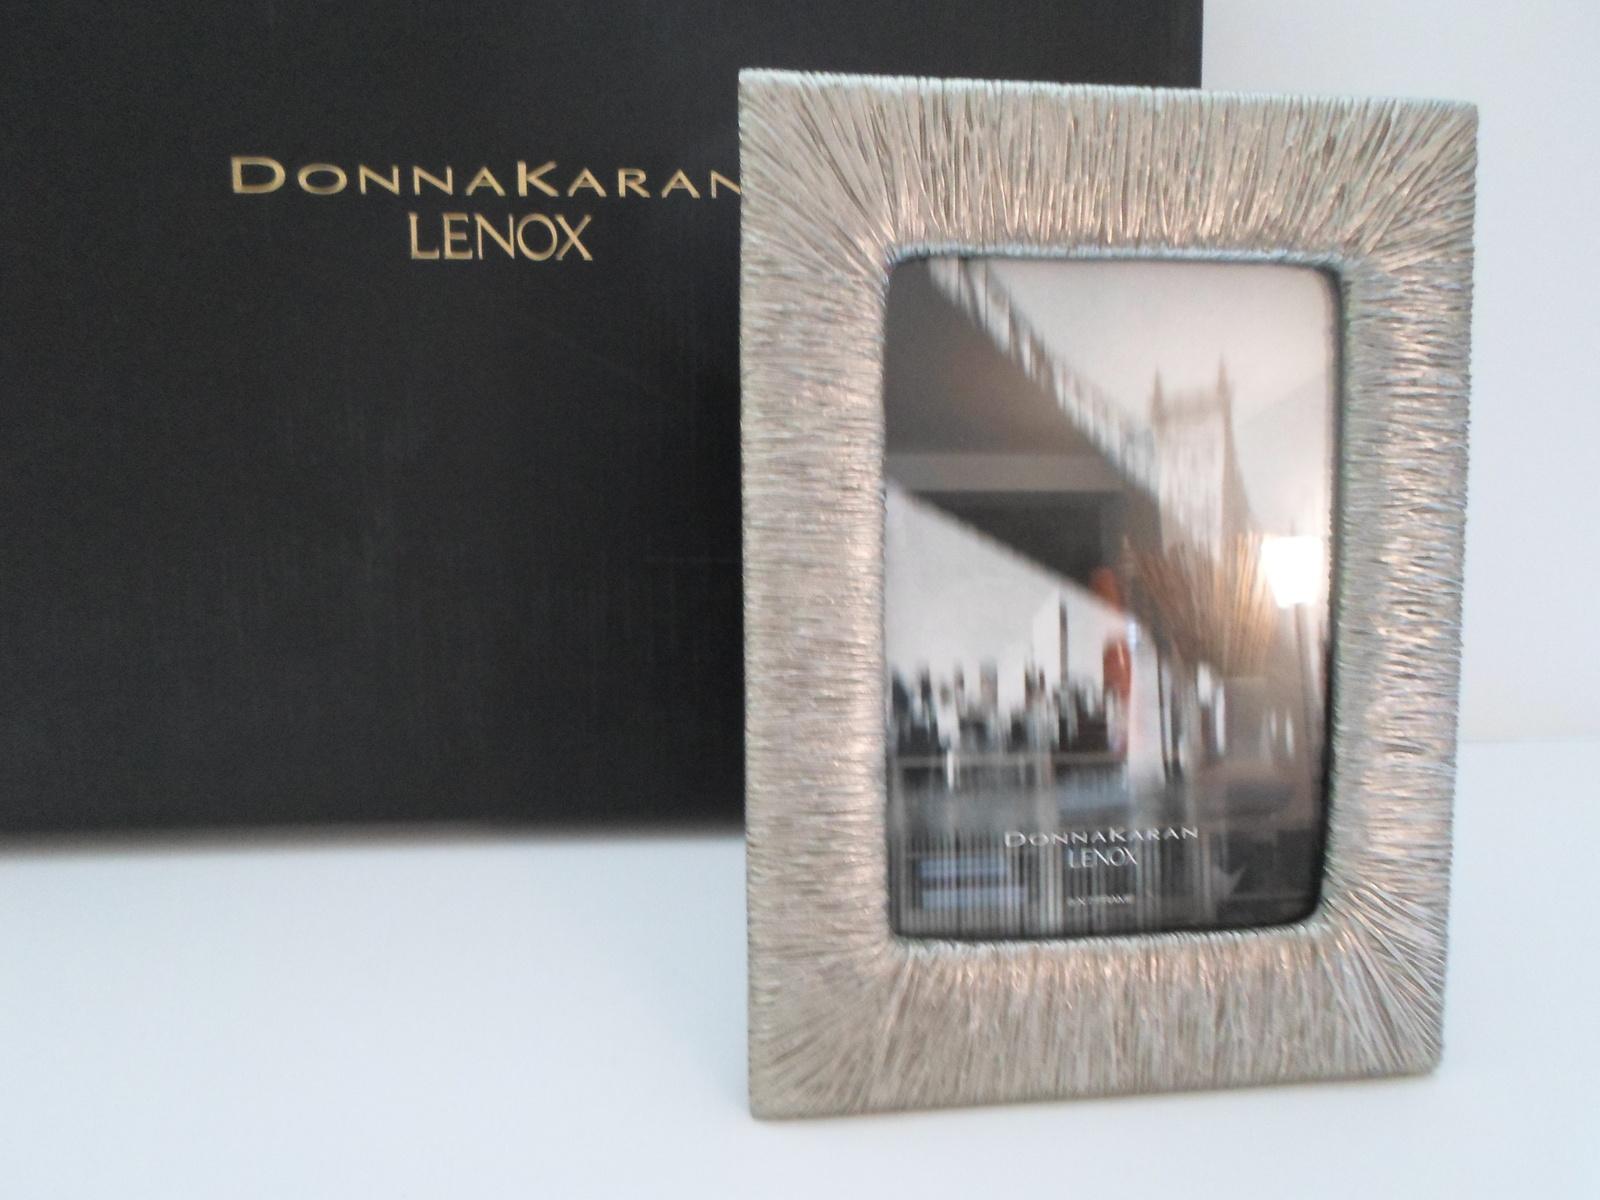 Donna Karan Lenox Wrap Silver 5 X 7 Frame and 50 similar items